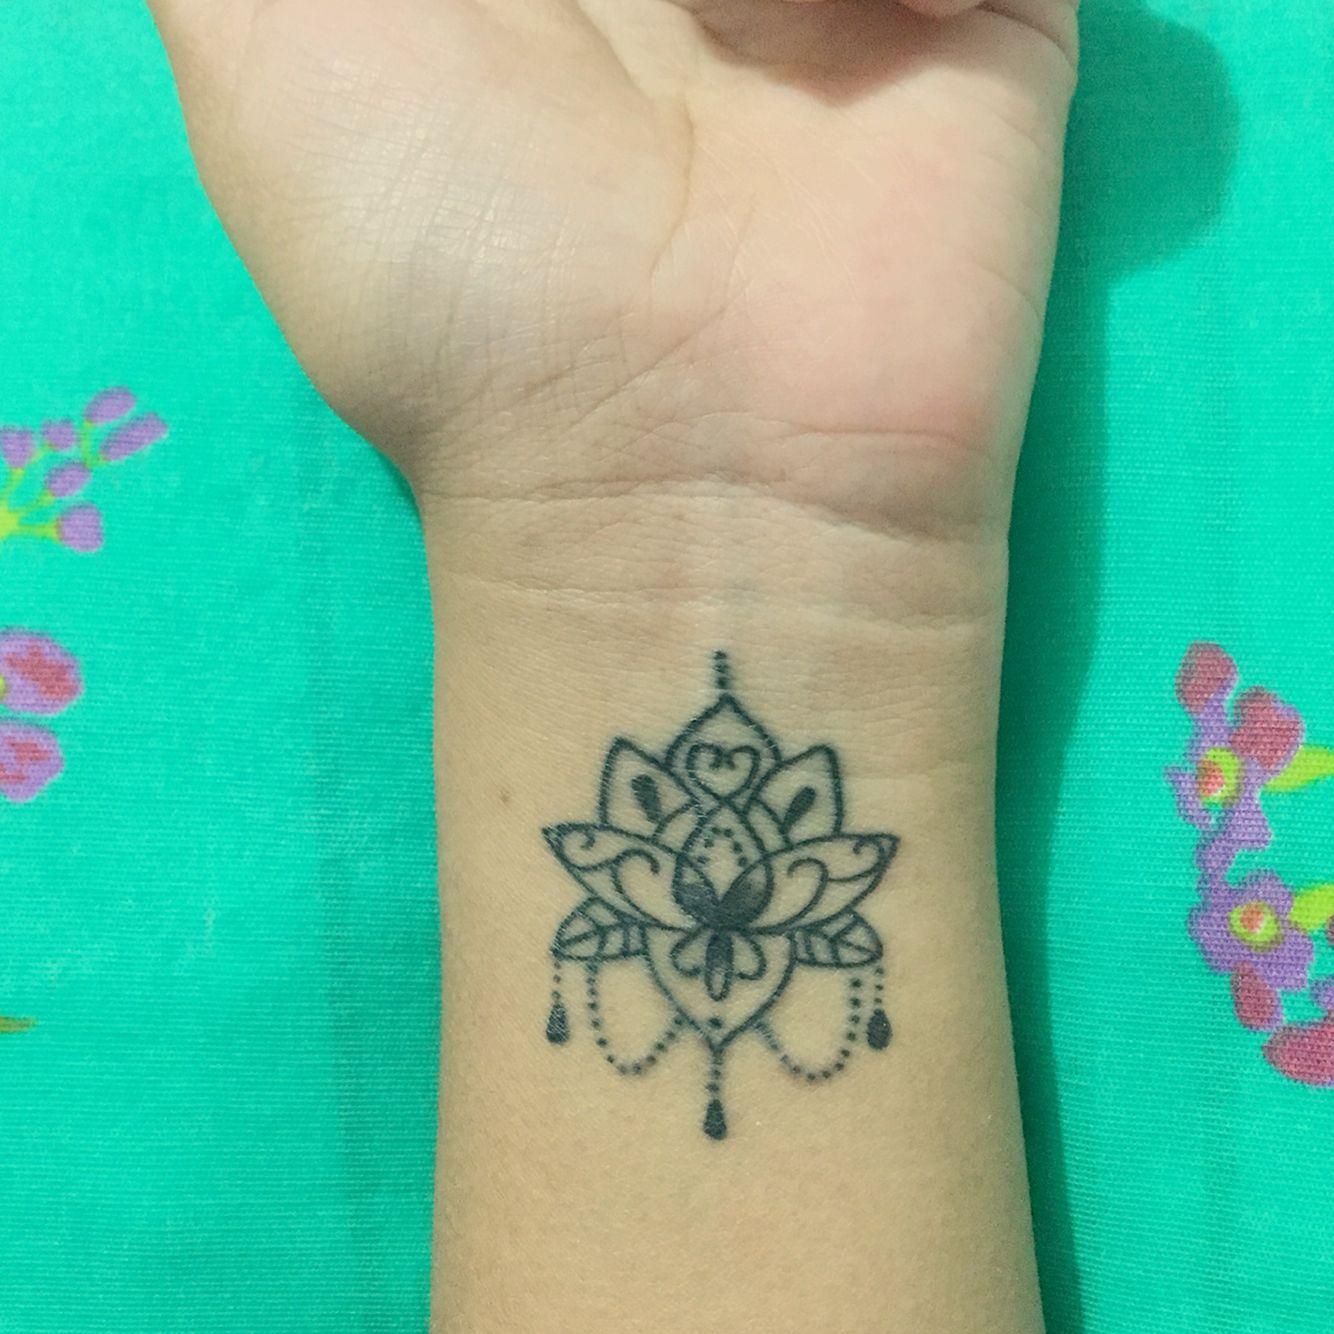 Tatuaje pequeo de flor de loto en la mueca tatuajes pinterest tatuaje pequeo de flor de loto en la mueca tattoo ideasvipgeekbeautifultattoossmall tattoolotus flowerirezumitattoo izmirmasajfo